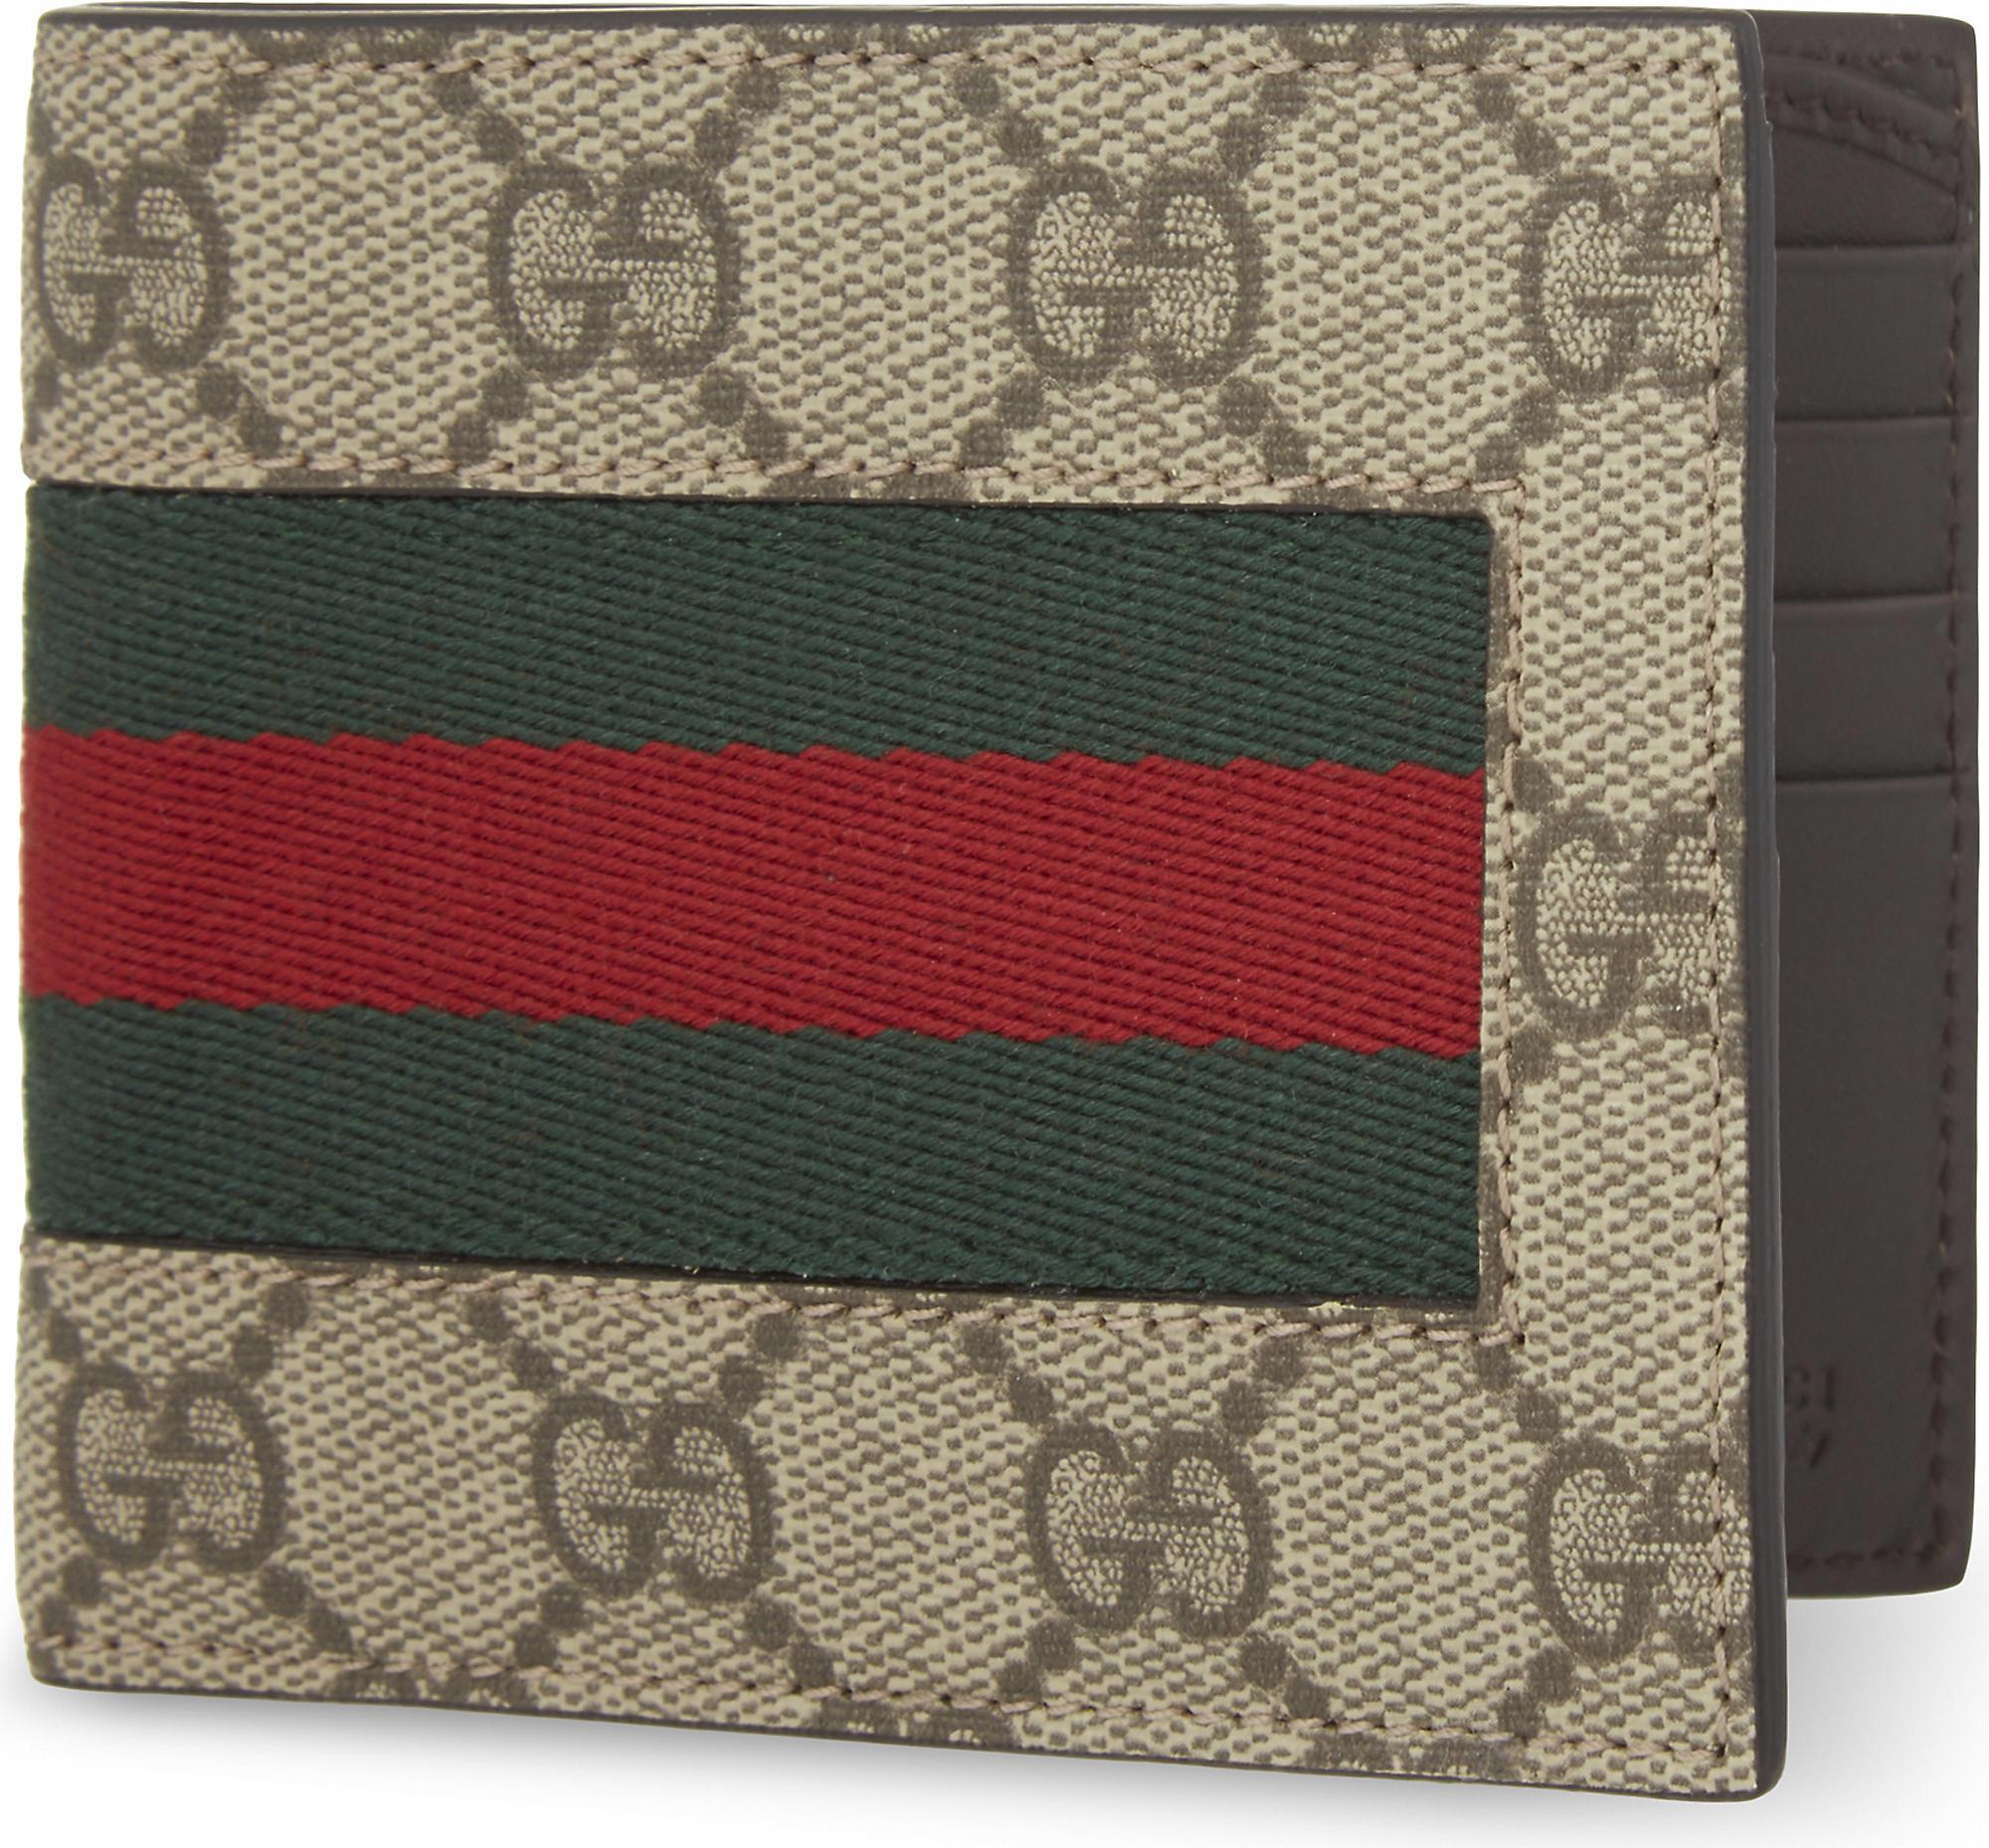 65b6c3bb Gucci Green Web GG Supreme Billfold Wallet for men